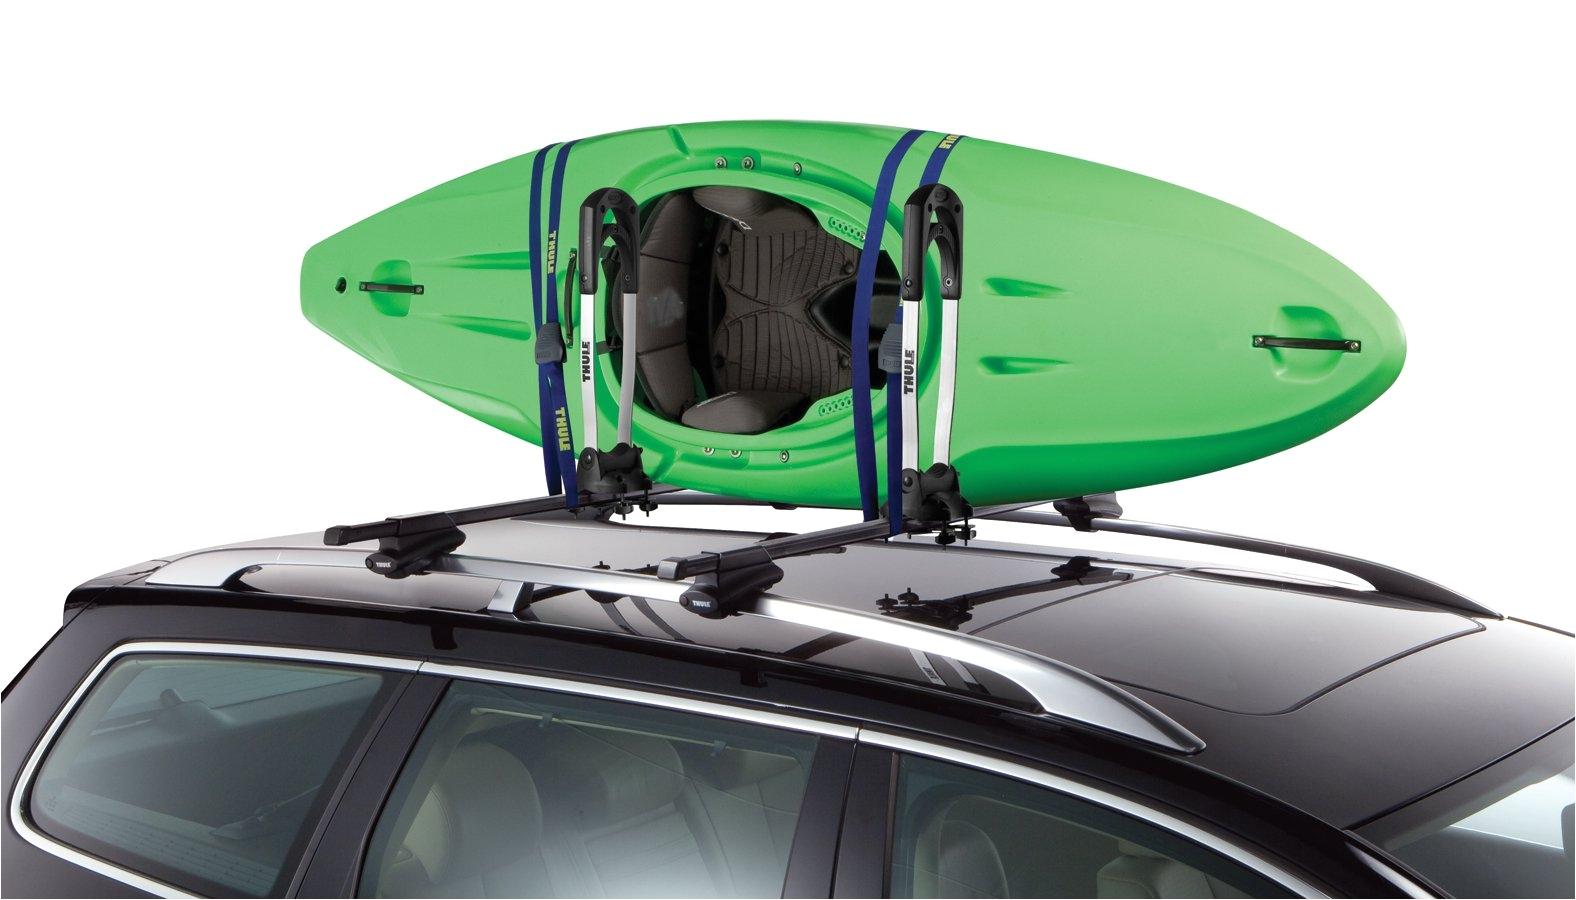 Thule Kayak Rack for 2 Kayaks Thule Stacker Kayak Carrier Thule Stacker Rooftop Kayak Rack